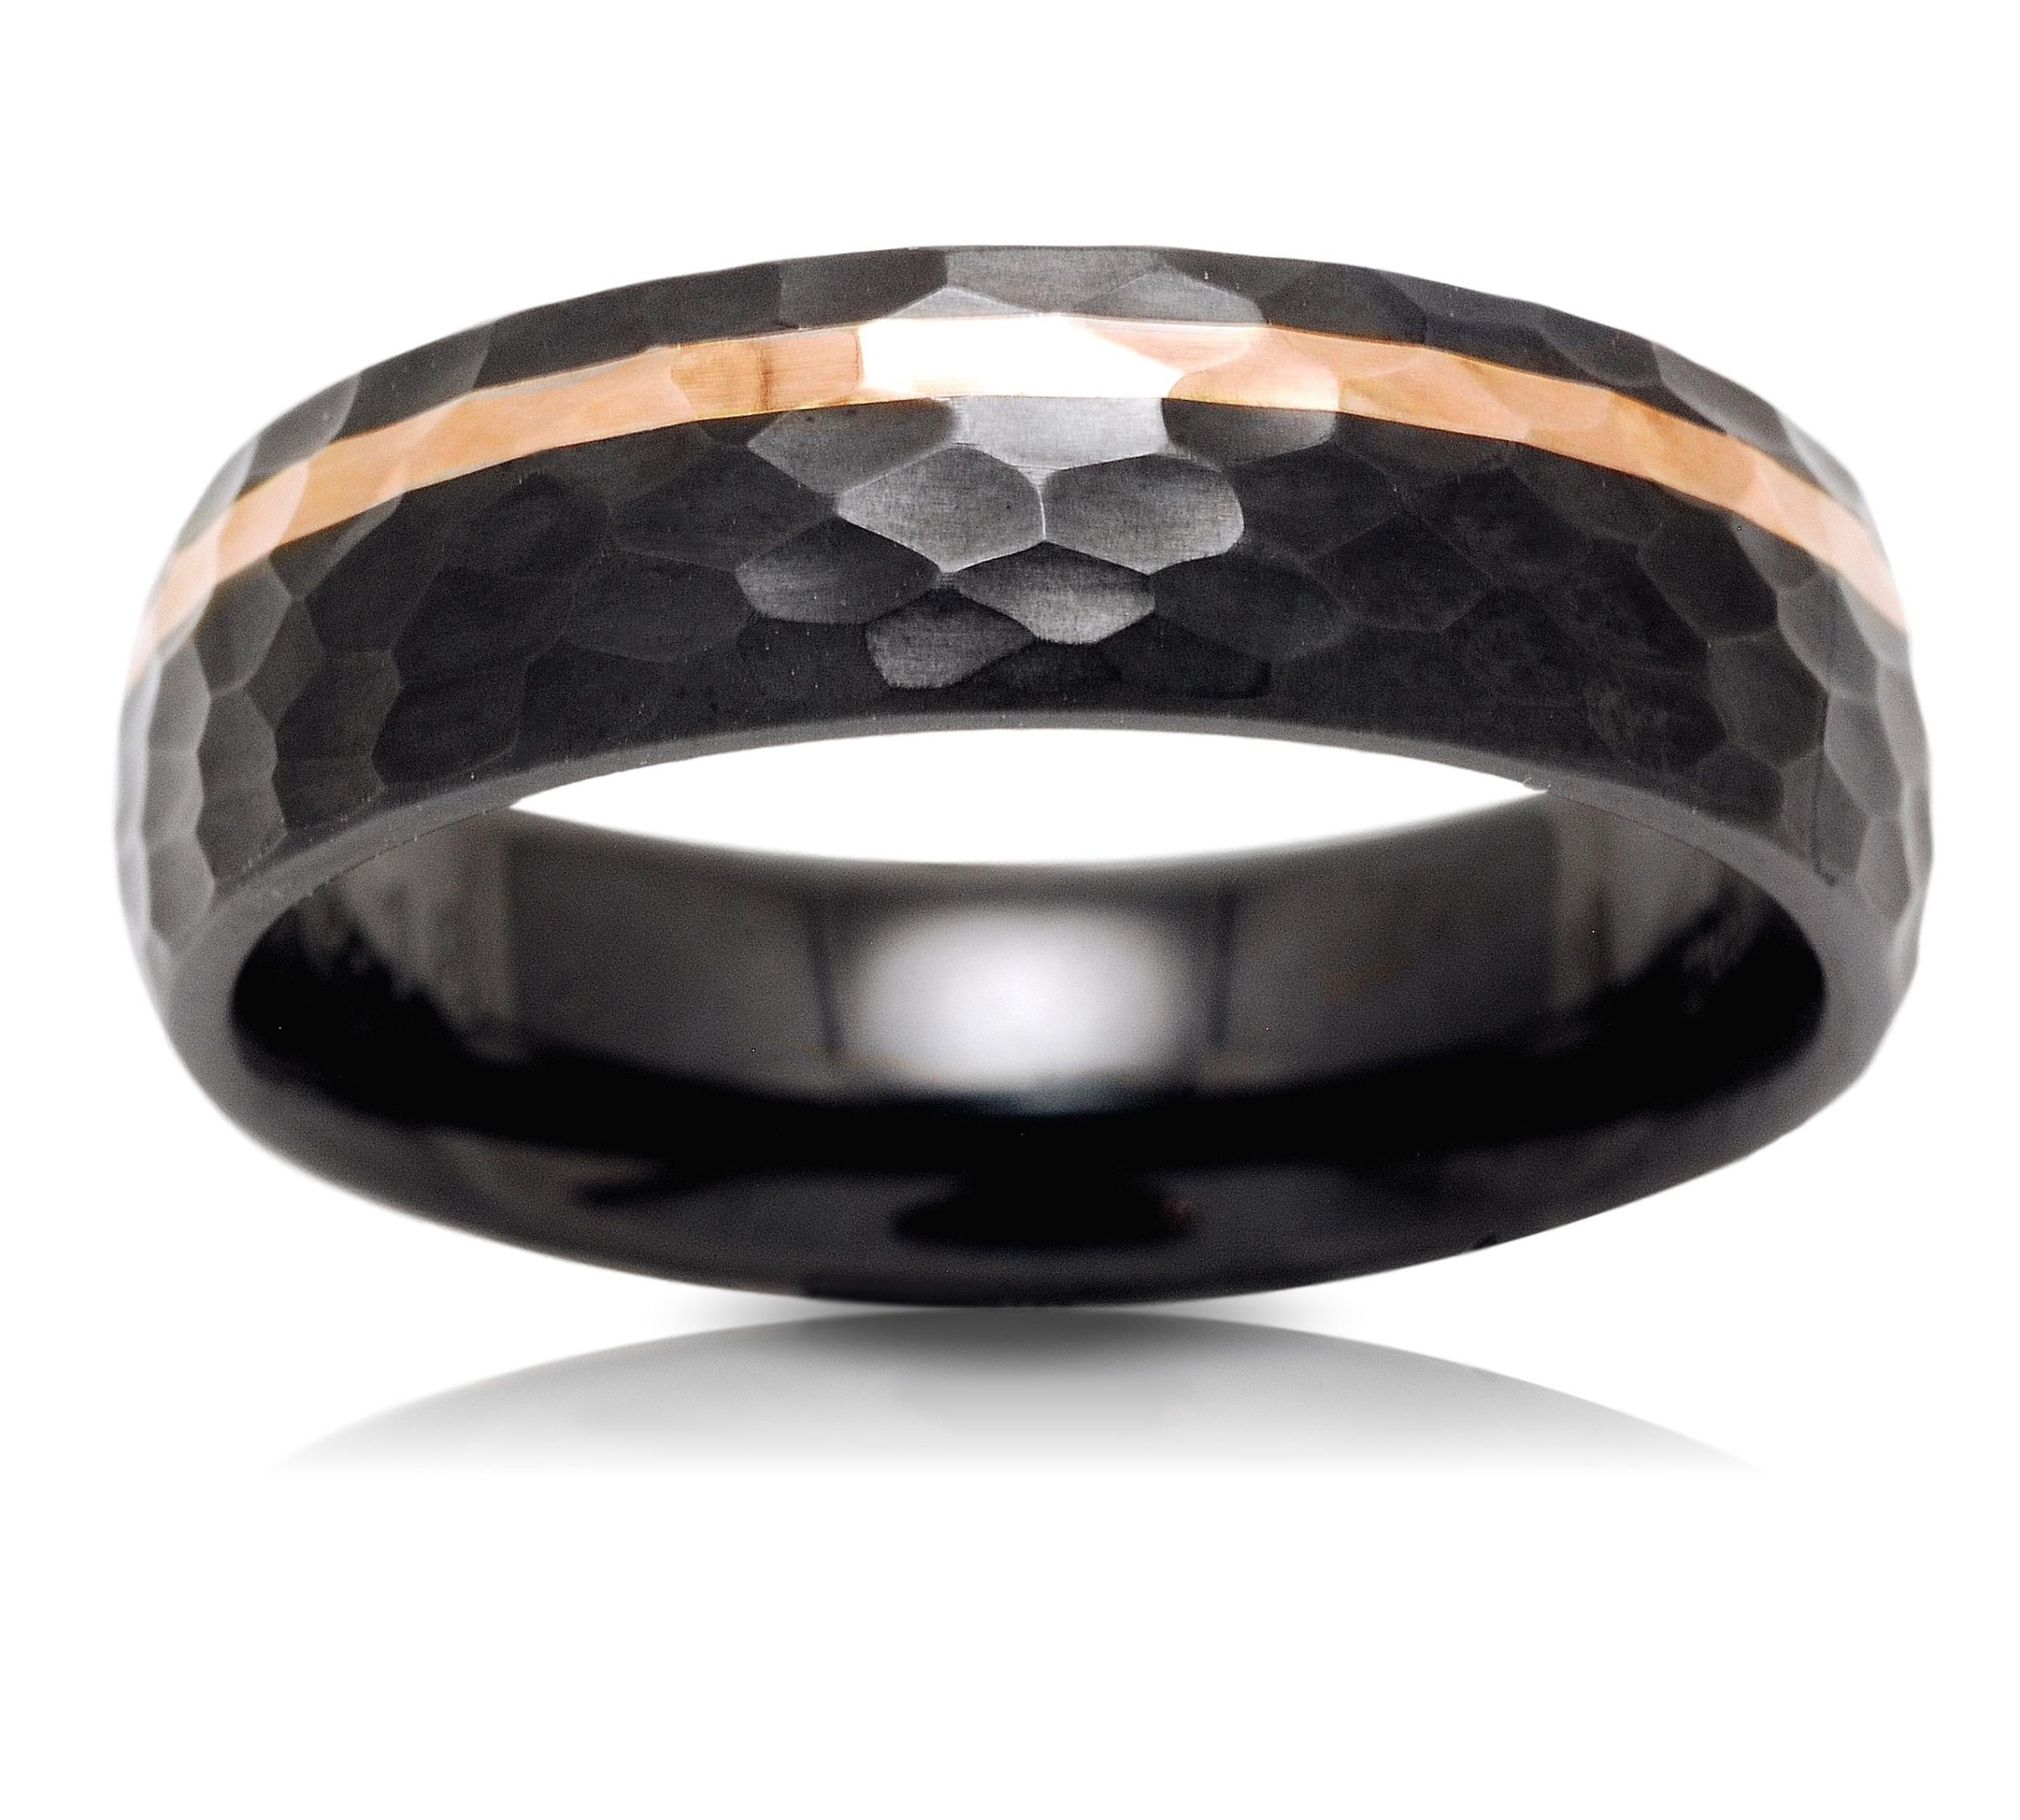 Zirconium and Rose Gold Wedding Band by Lashbrook Designs